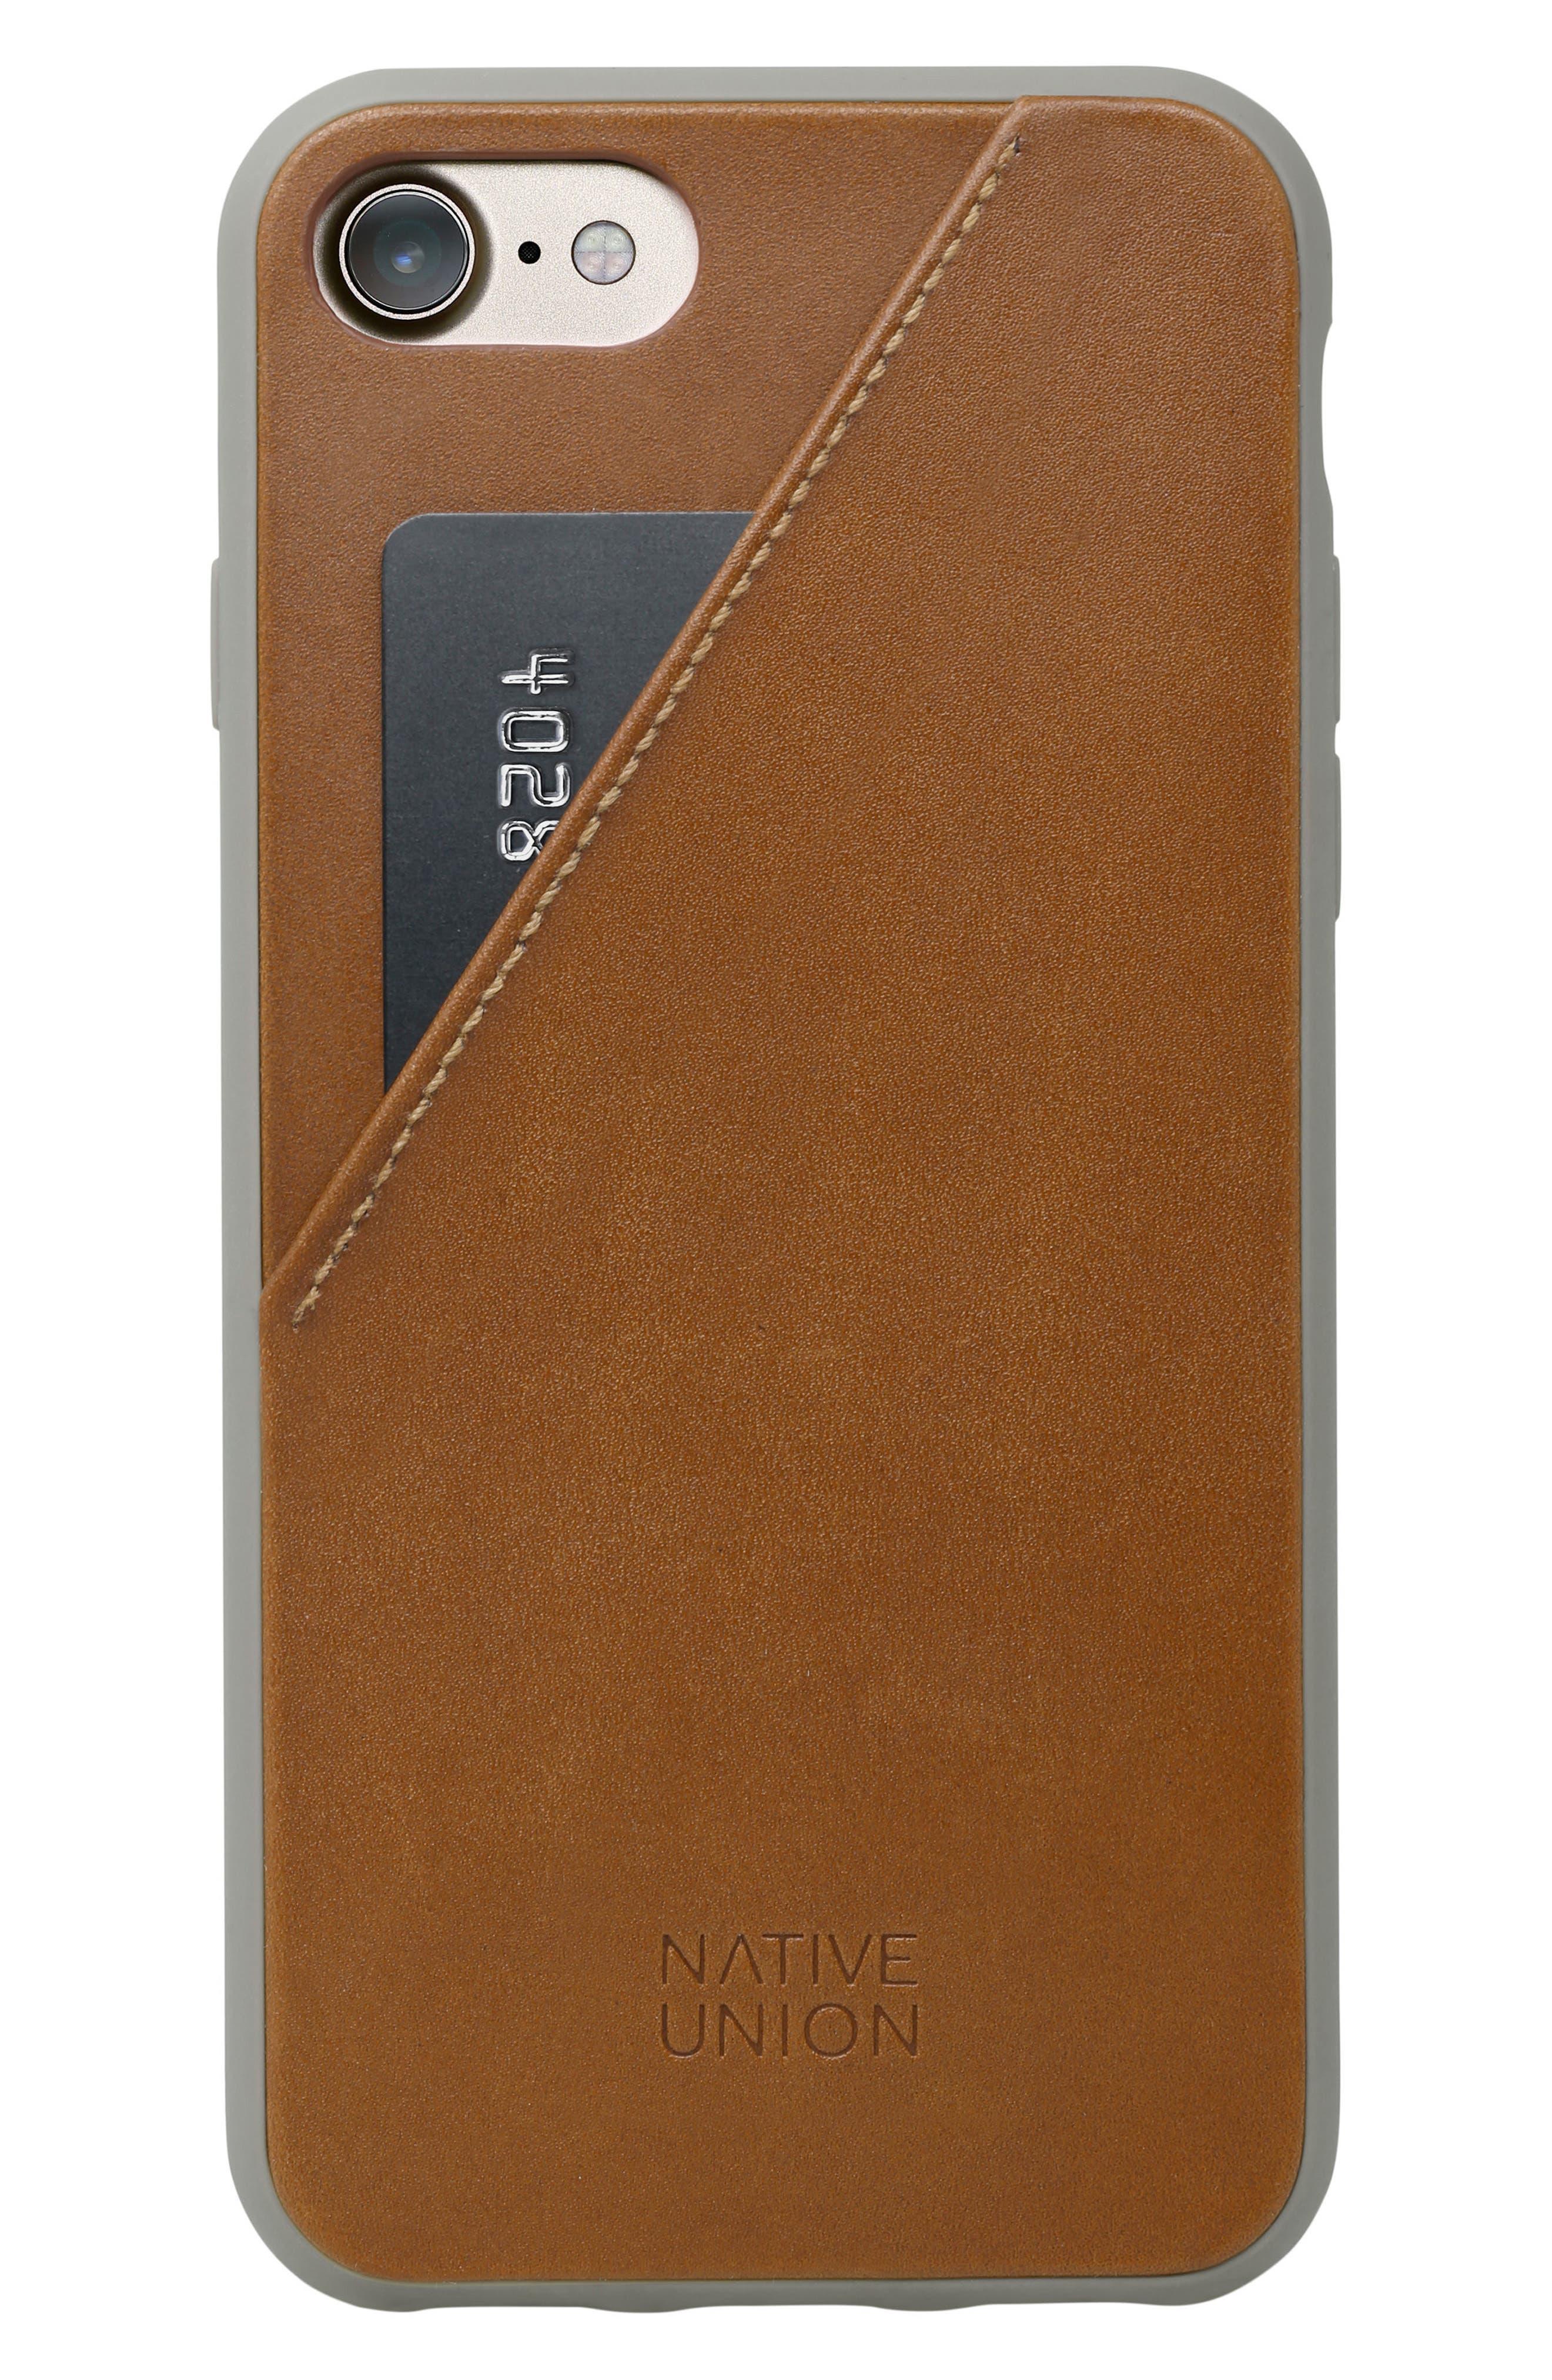 Main Image - Native Union CLIC Card iPhone 7 & 7 Plus Case